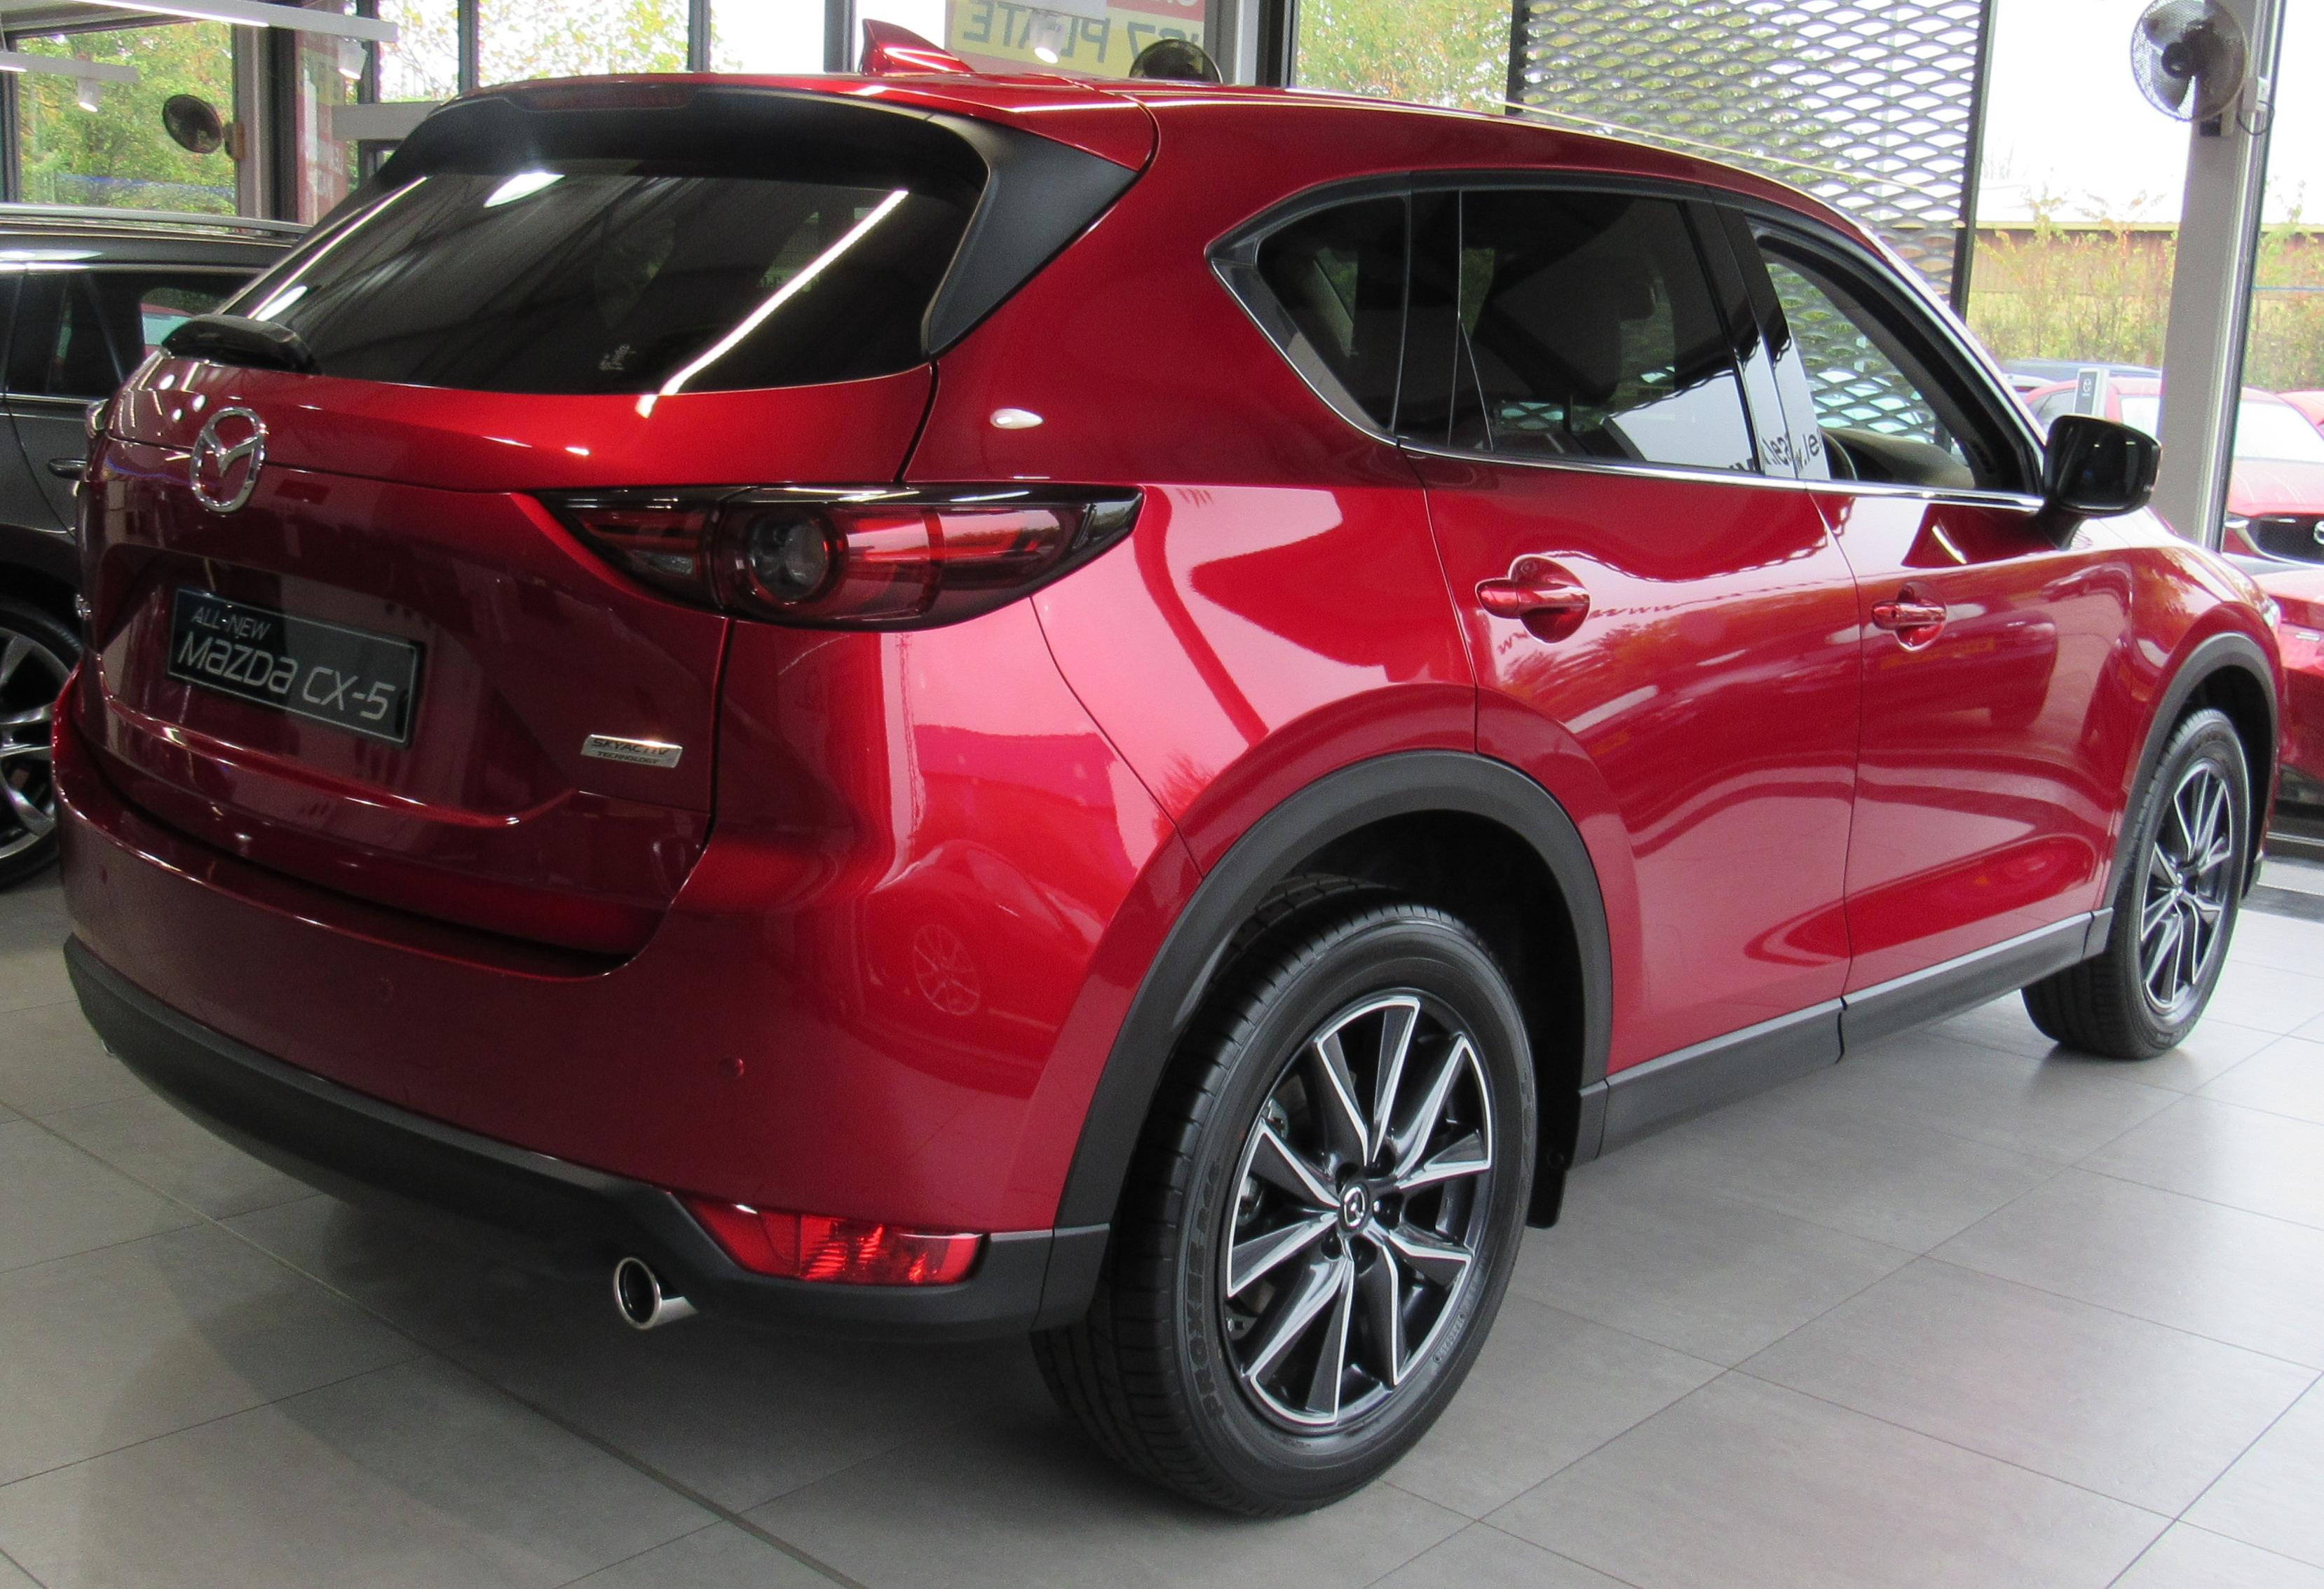 Leamington Mazda Cmc Group Leamington Spa